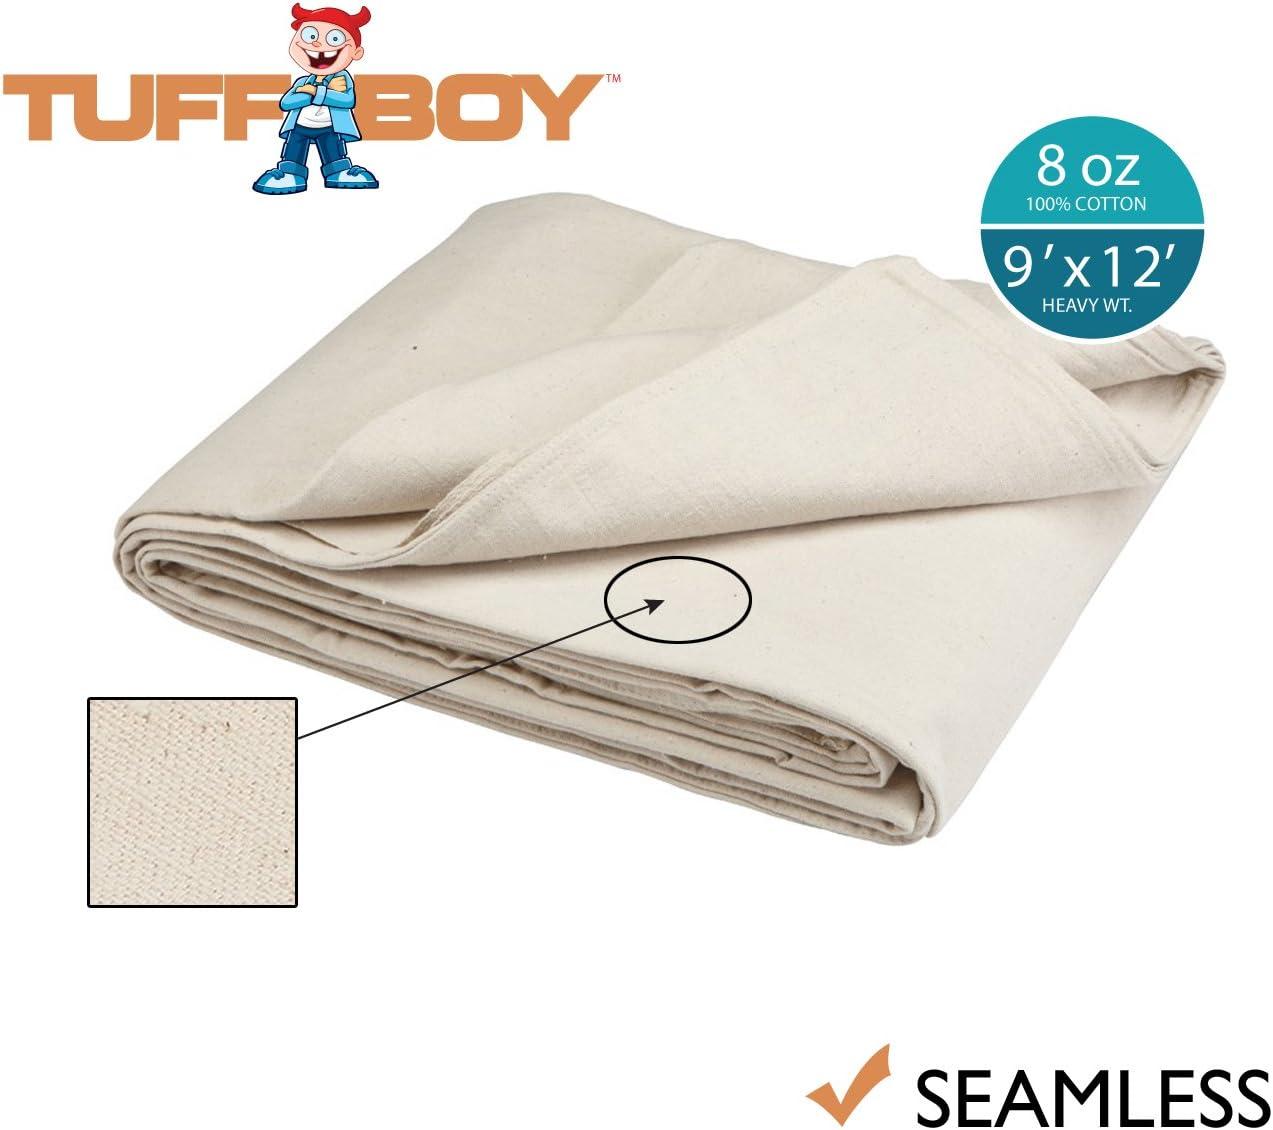 Tuff Boy Cotton Canvas Drop Cloth, Seamless, 9 x 12 Feet, 8 oz